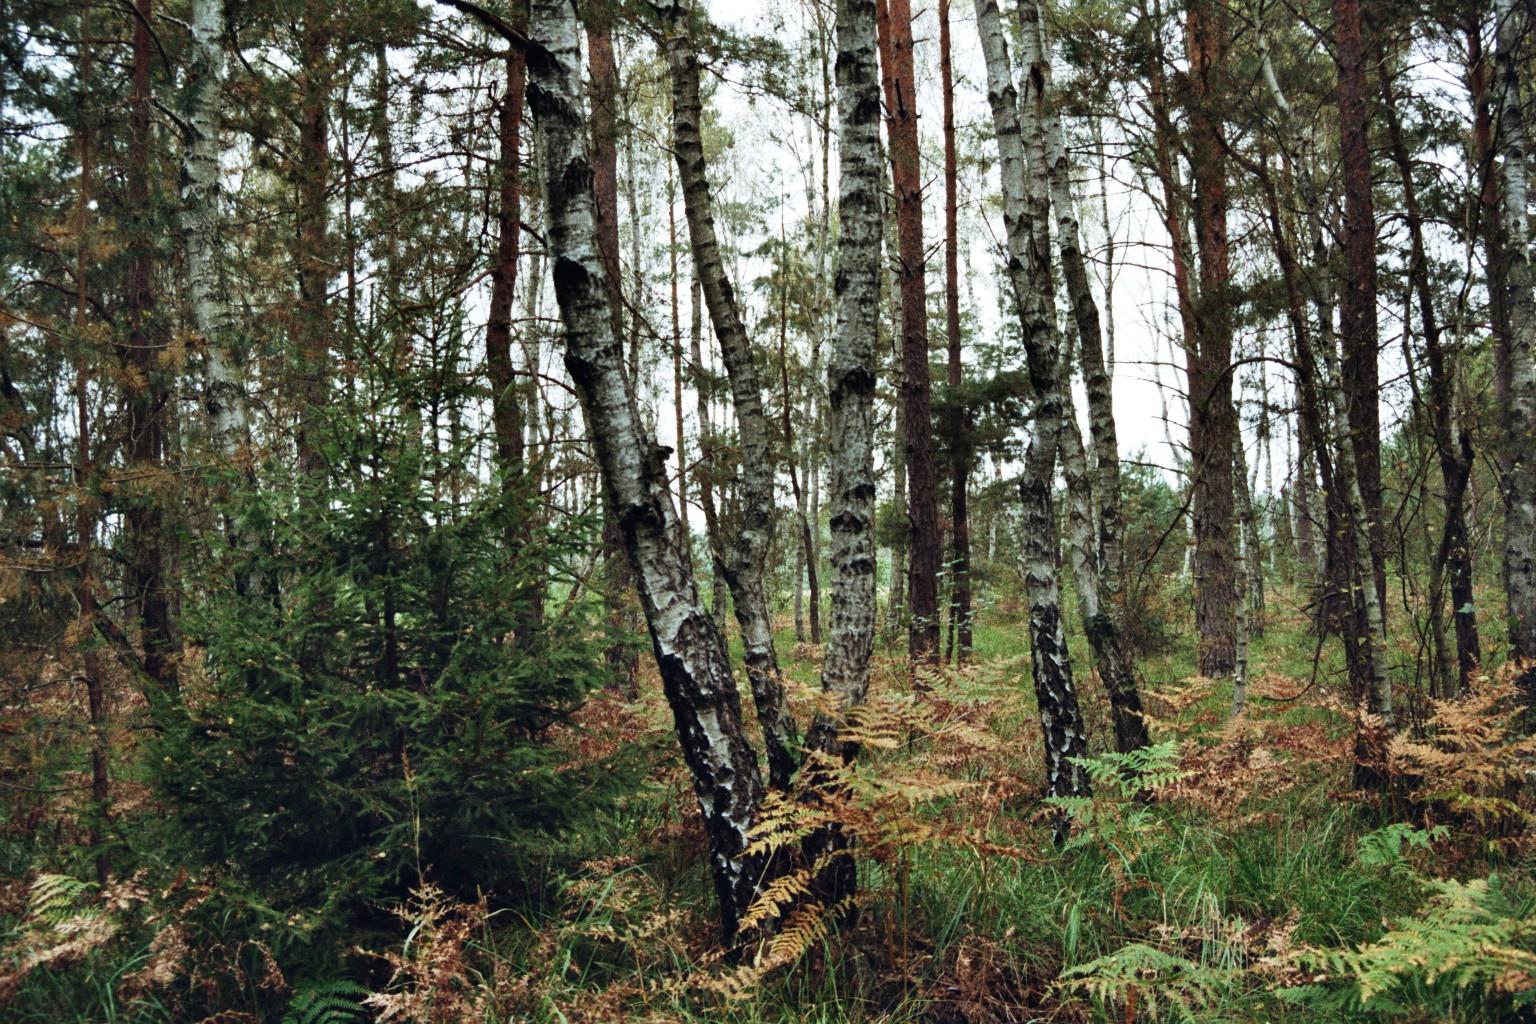 Birkenunterholz